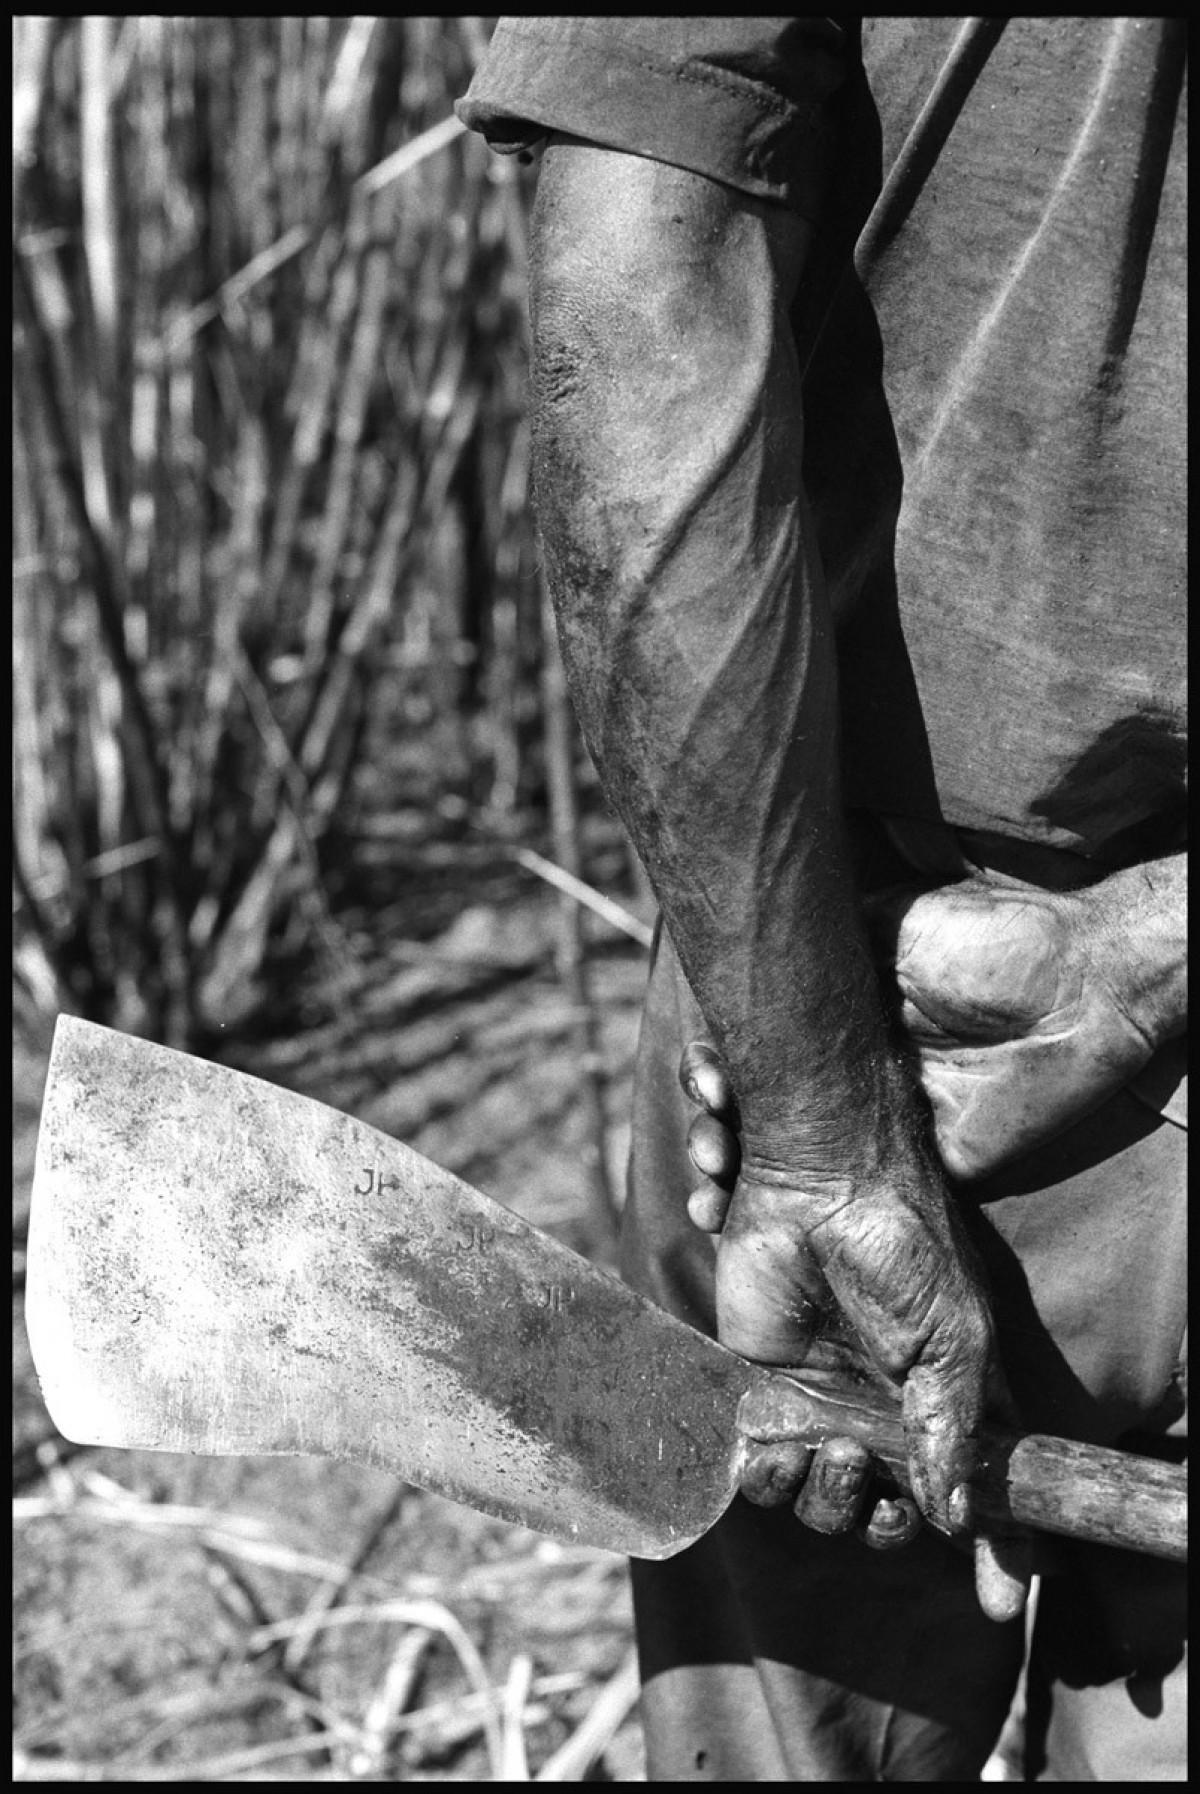 Sugarcane cutters